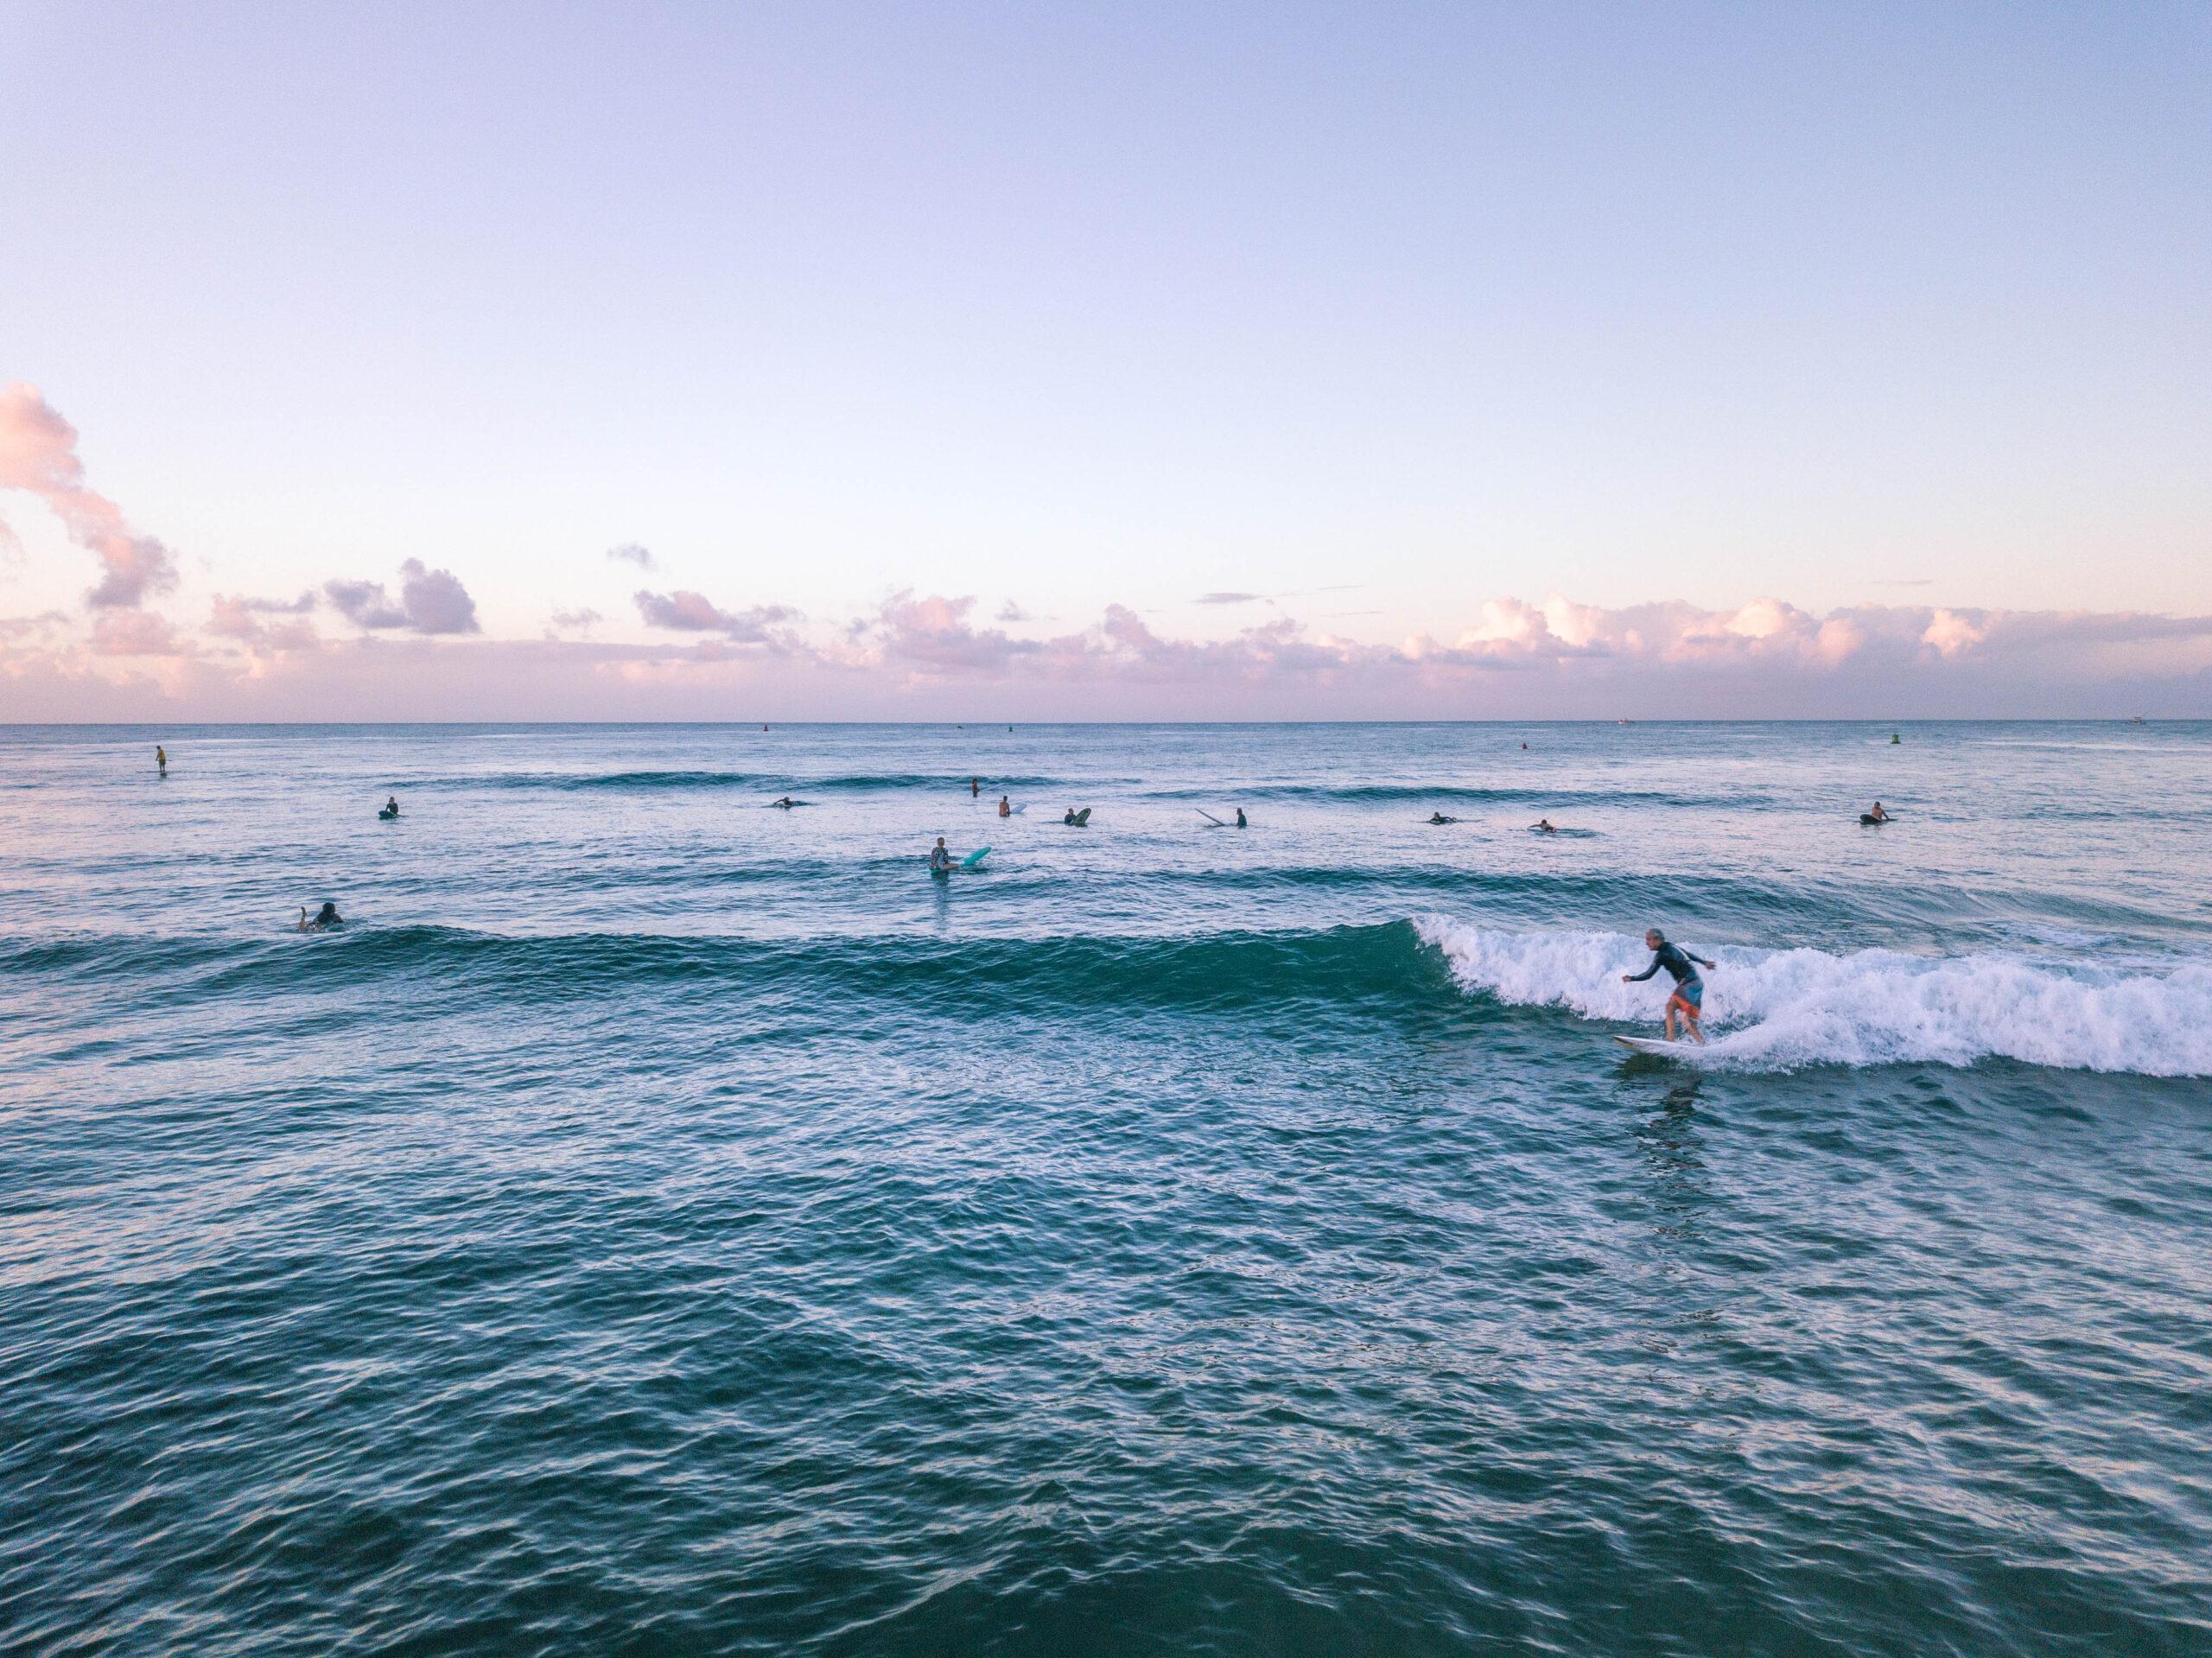 Sunrise Surfers - Oahu Hawaii